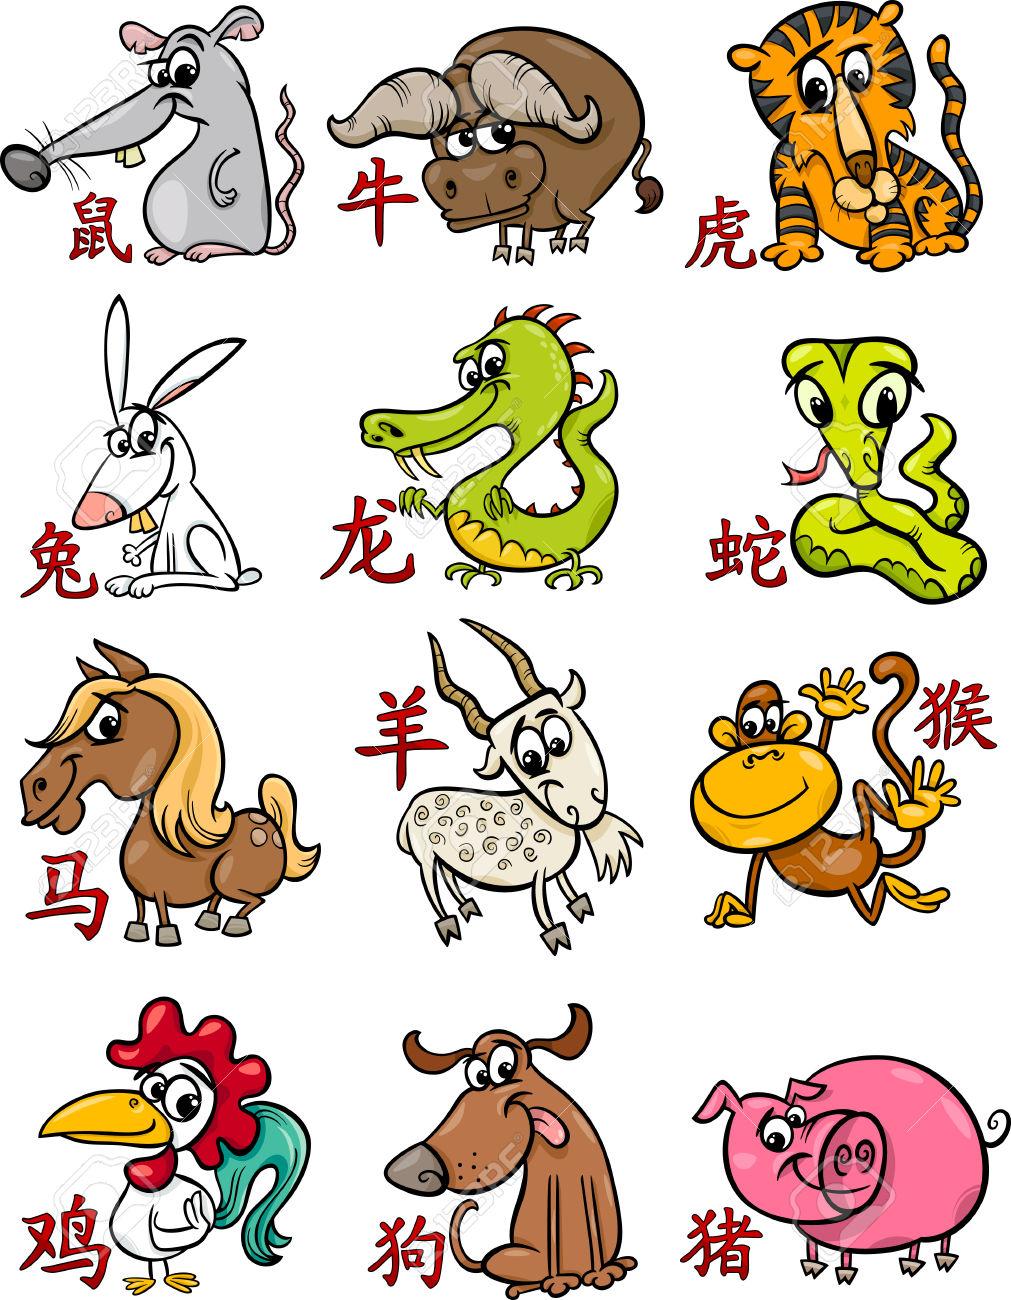 Cartoon Illustration Of All Chinese Zodiac Horoscope Signs Set.